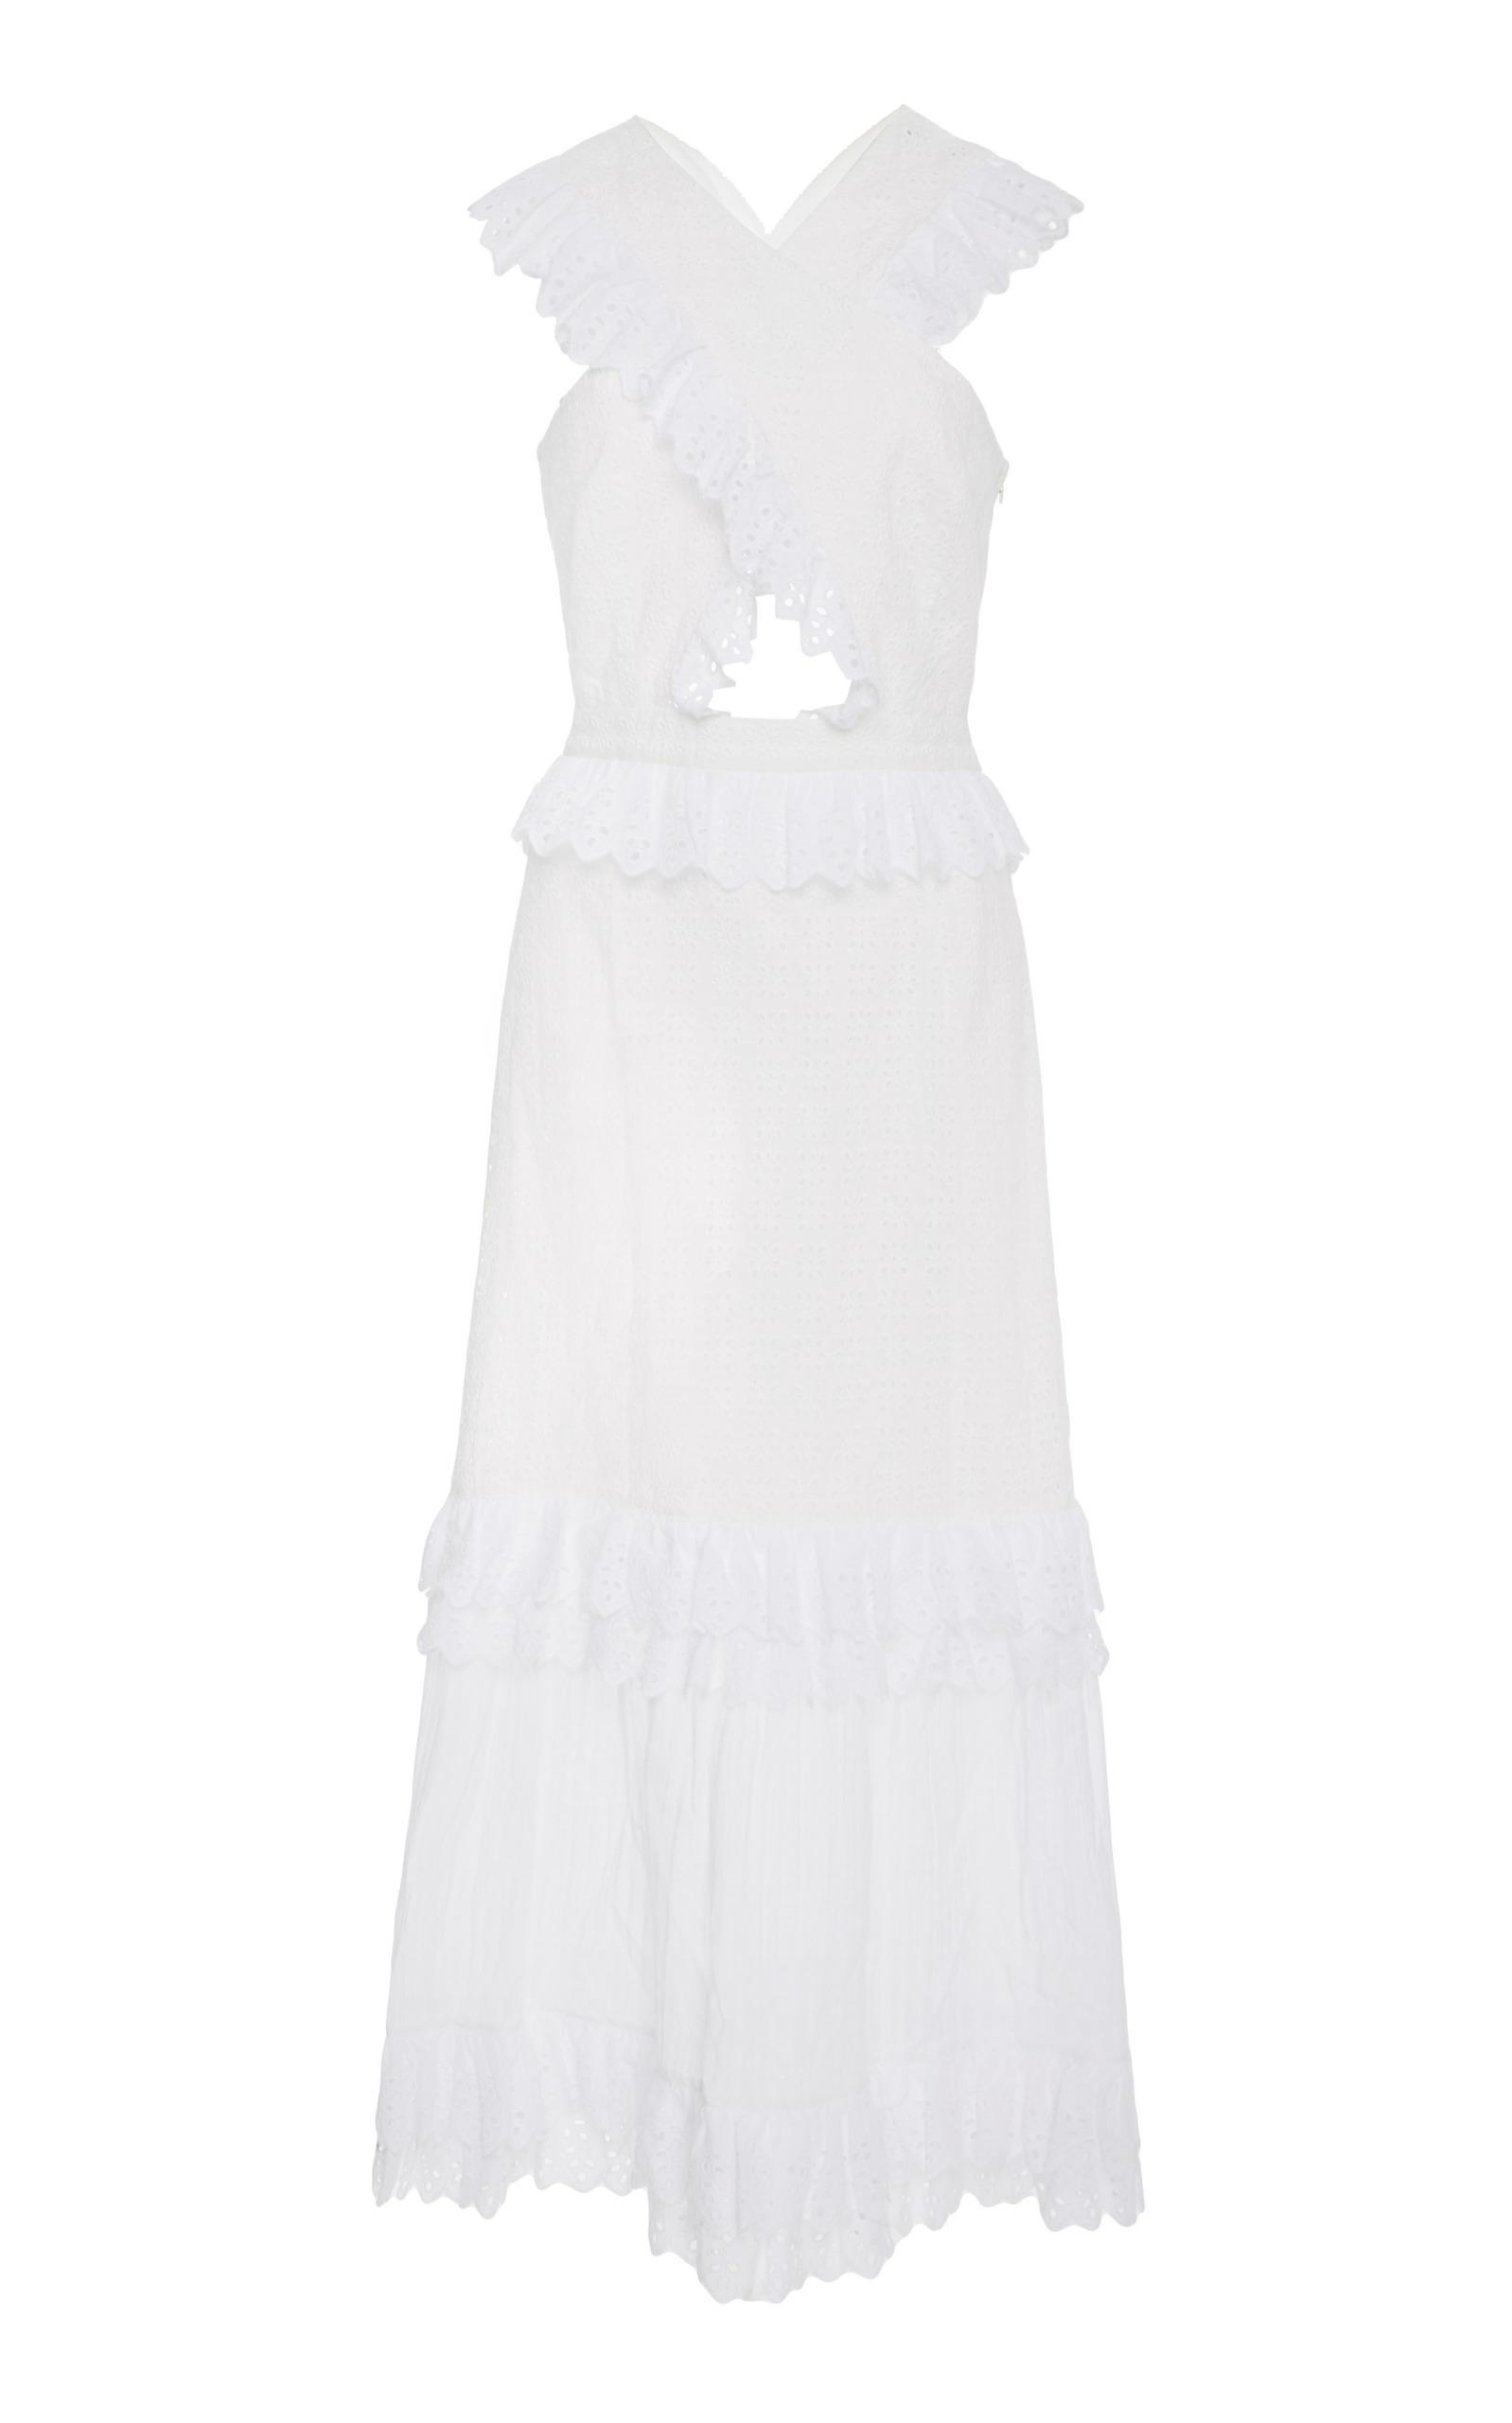 large_alice-mccall-white-everything-she-wants-midi-dress.jpg